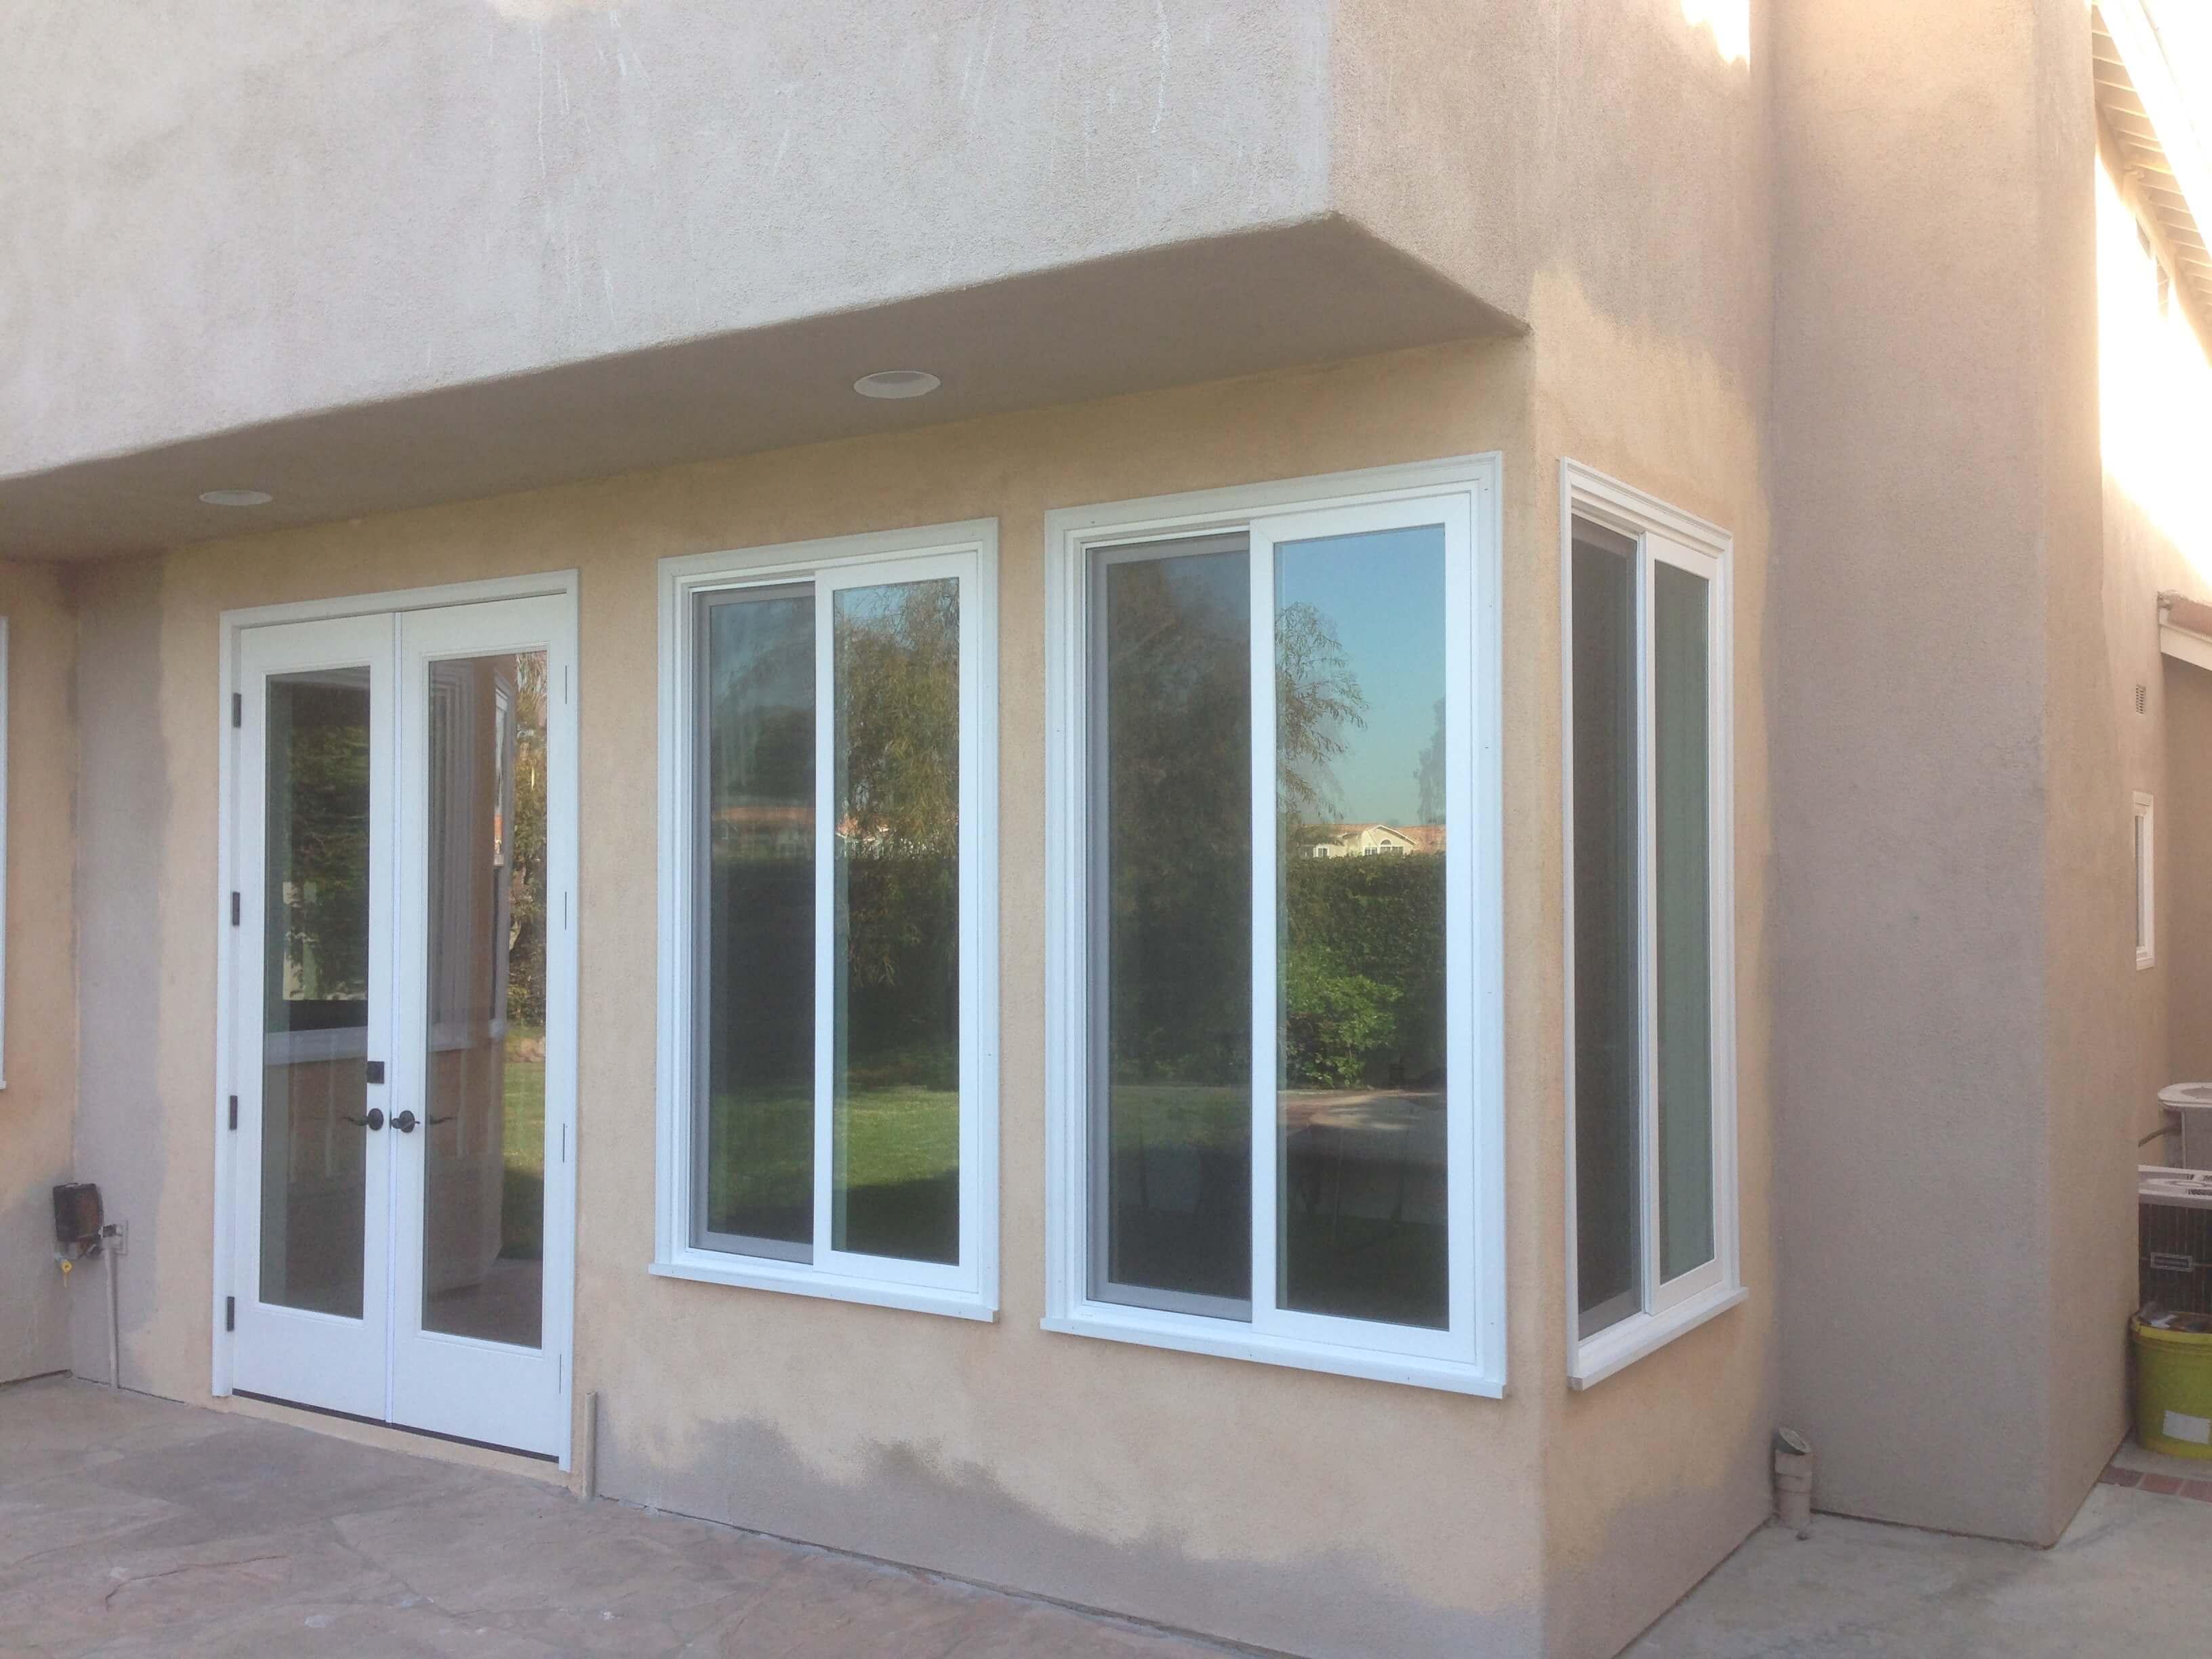 Milgard Cunningham Doors Amp Windows Santa Ana Ca